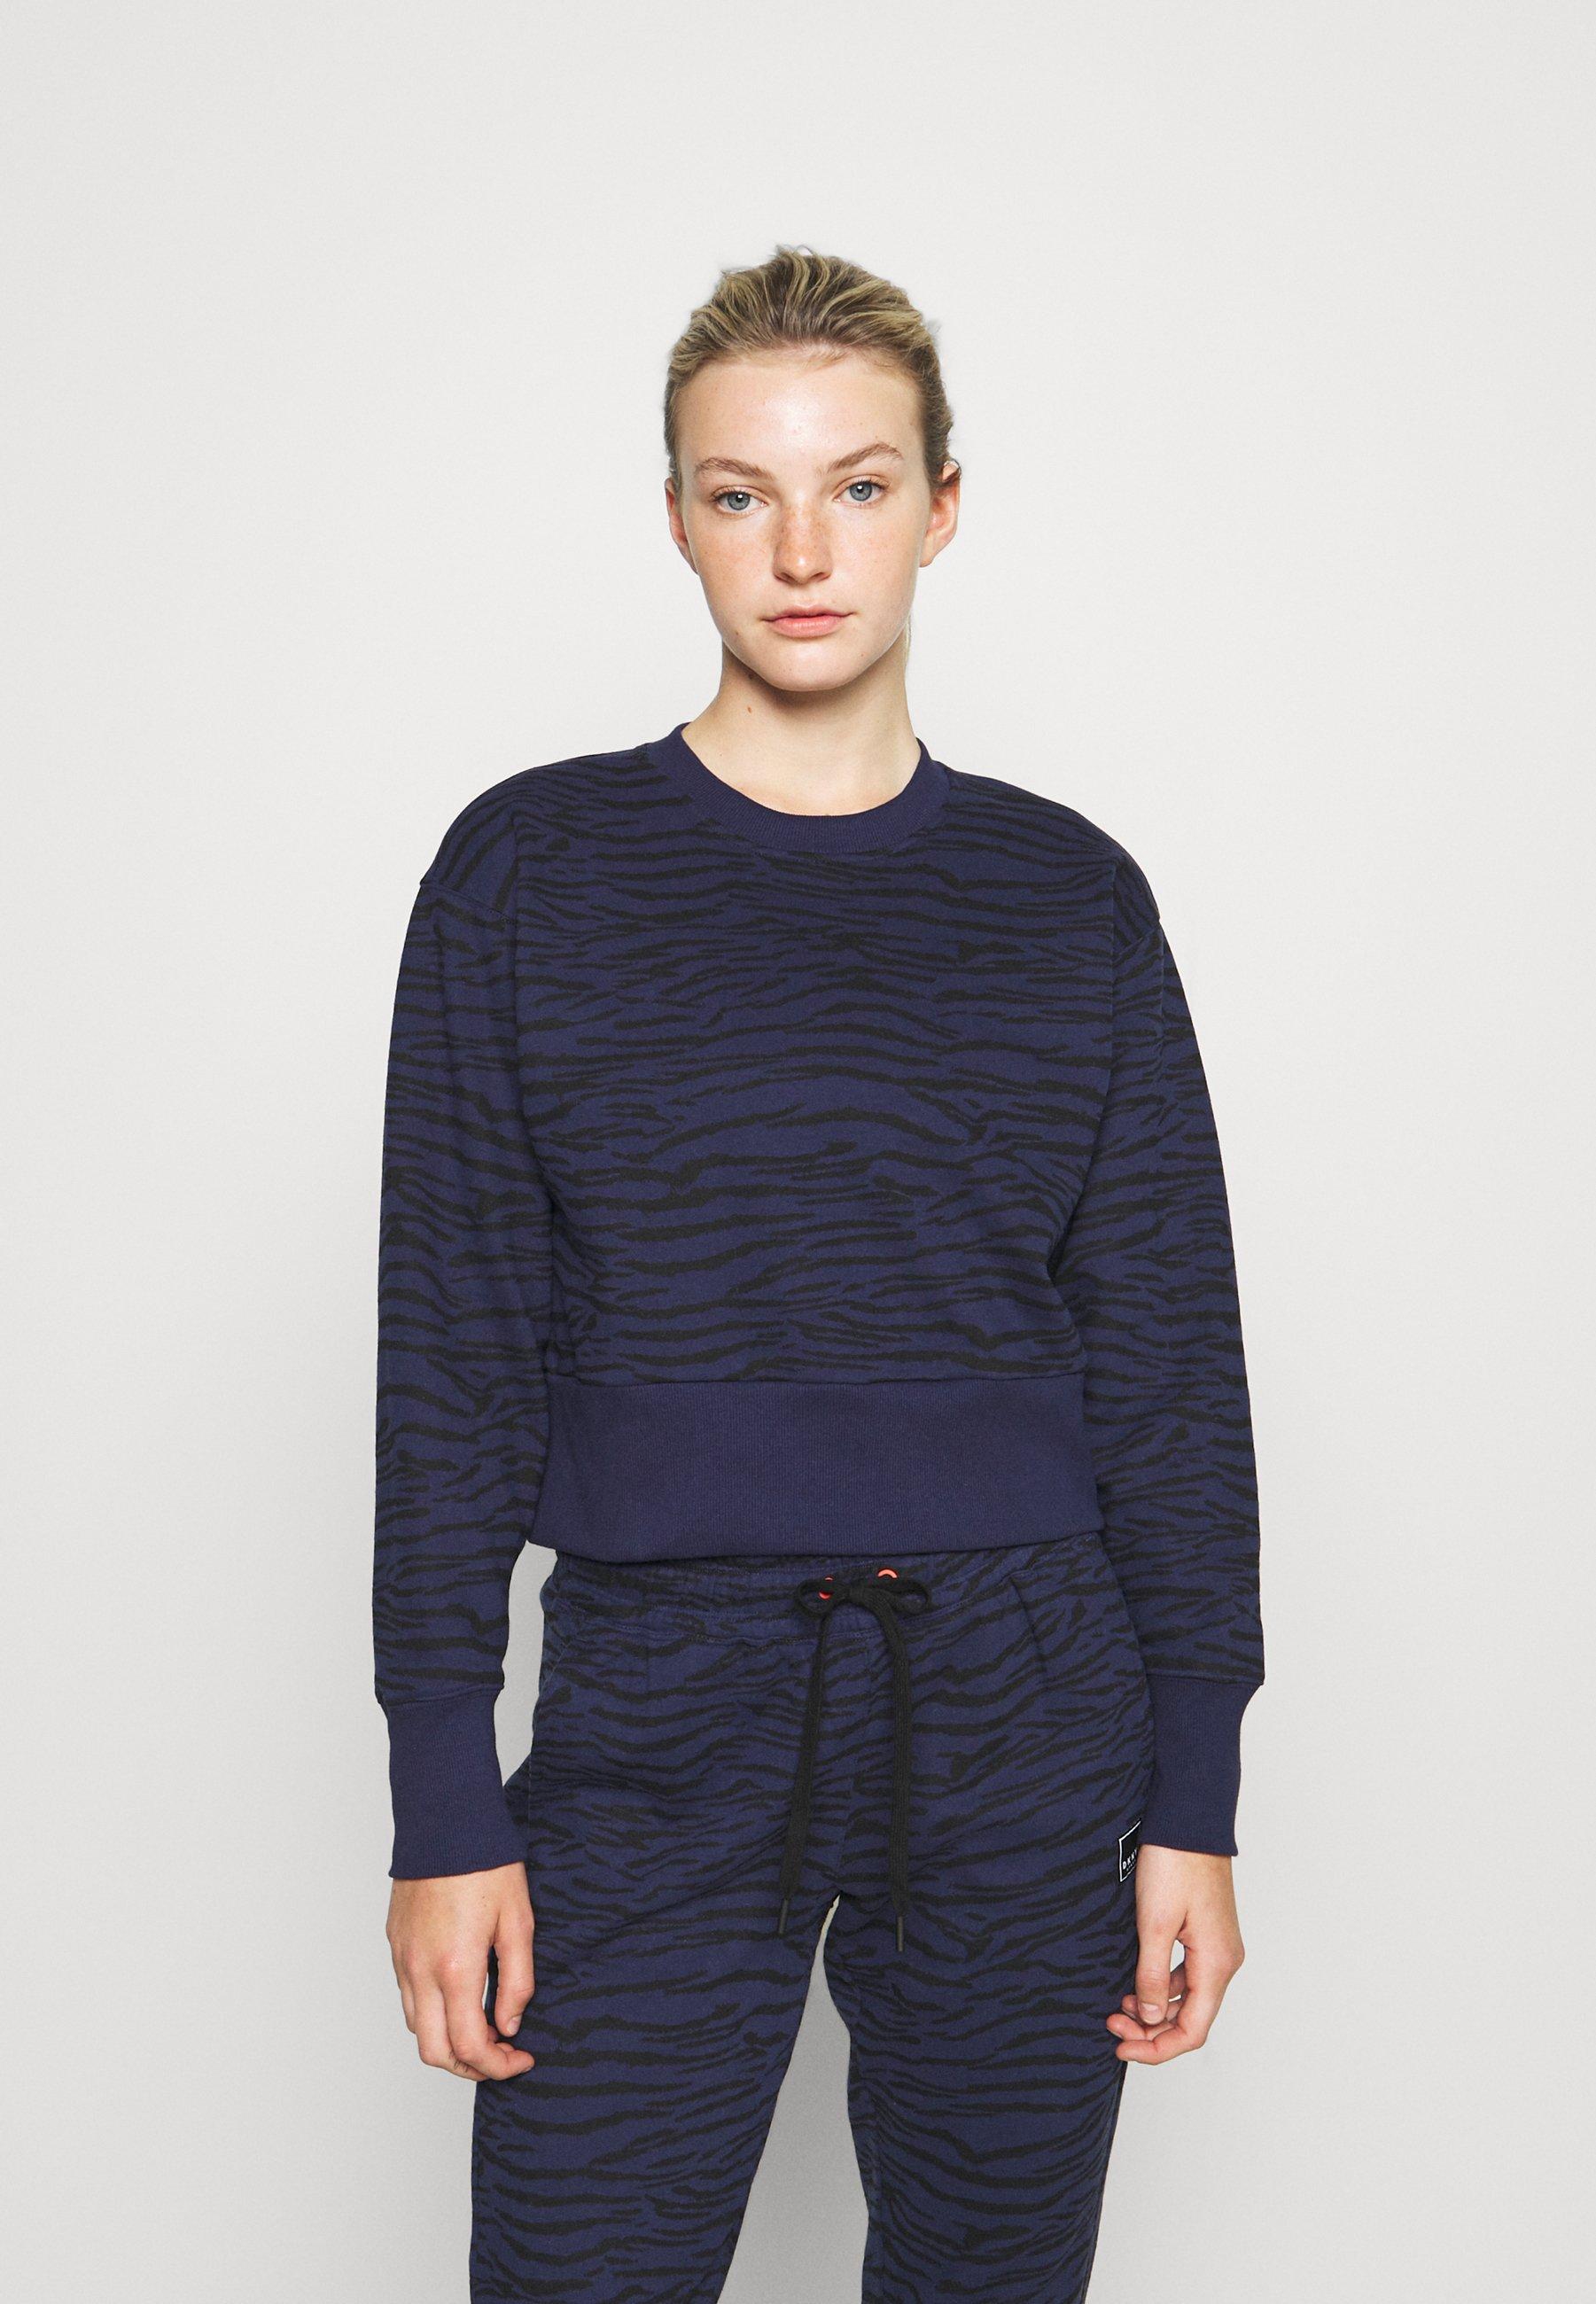 Damen TIGER KING PRINT CROPPED DROP SHOULDER CREW NECK - Sweatshirt